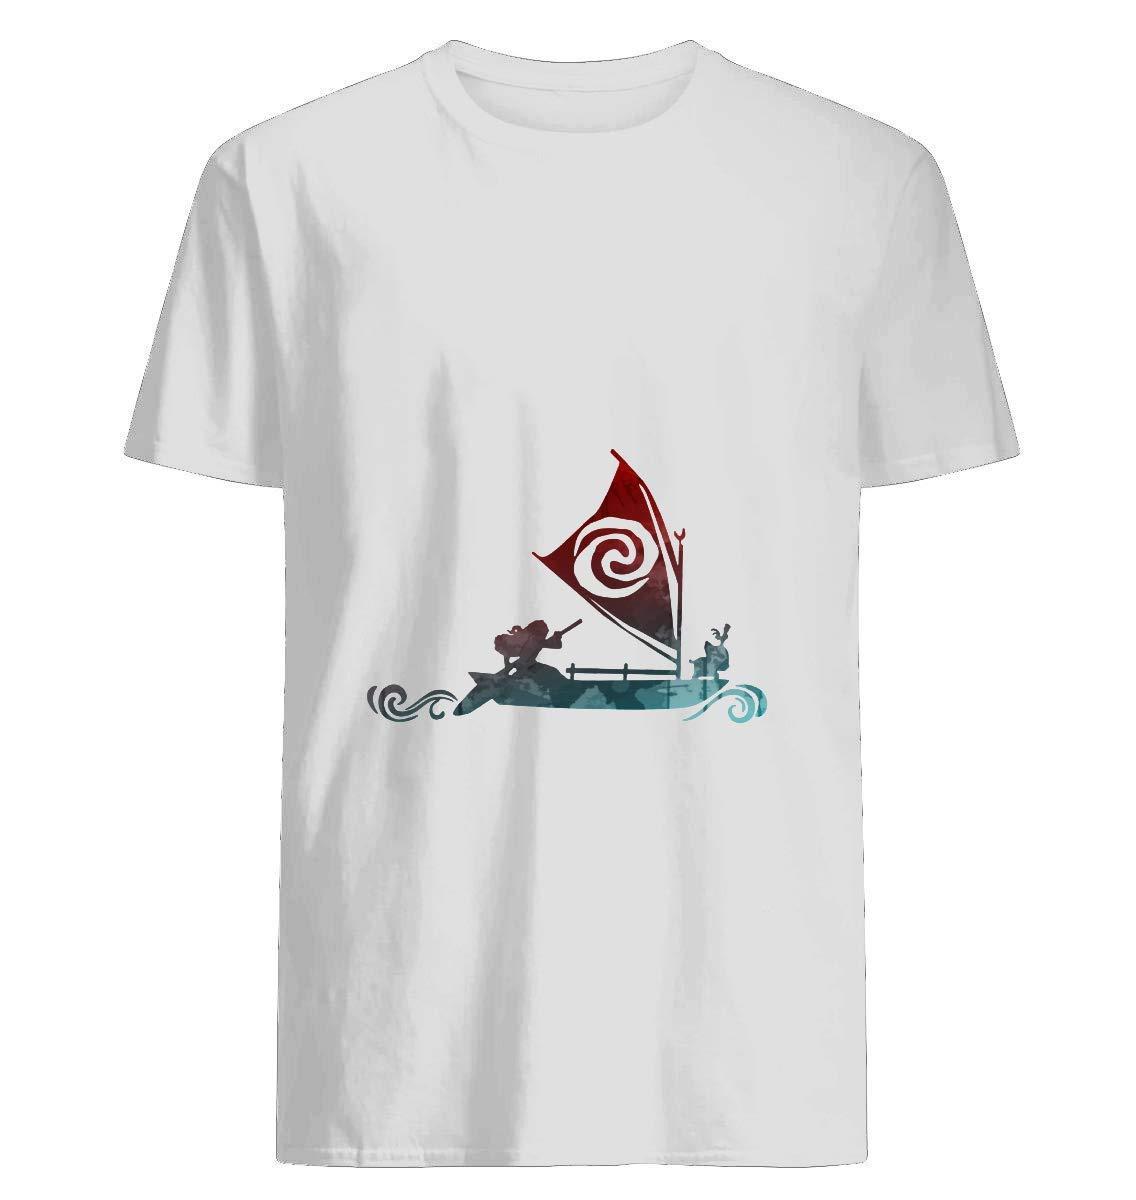 Boat Inspired Silhouette T Shirt For Unisex